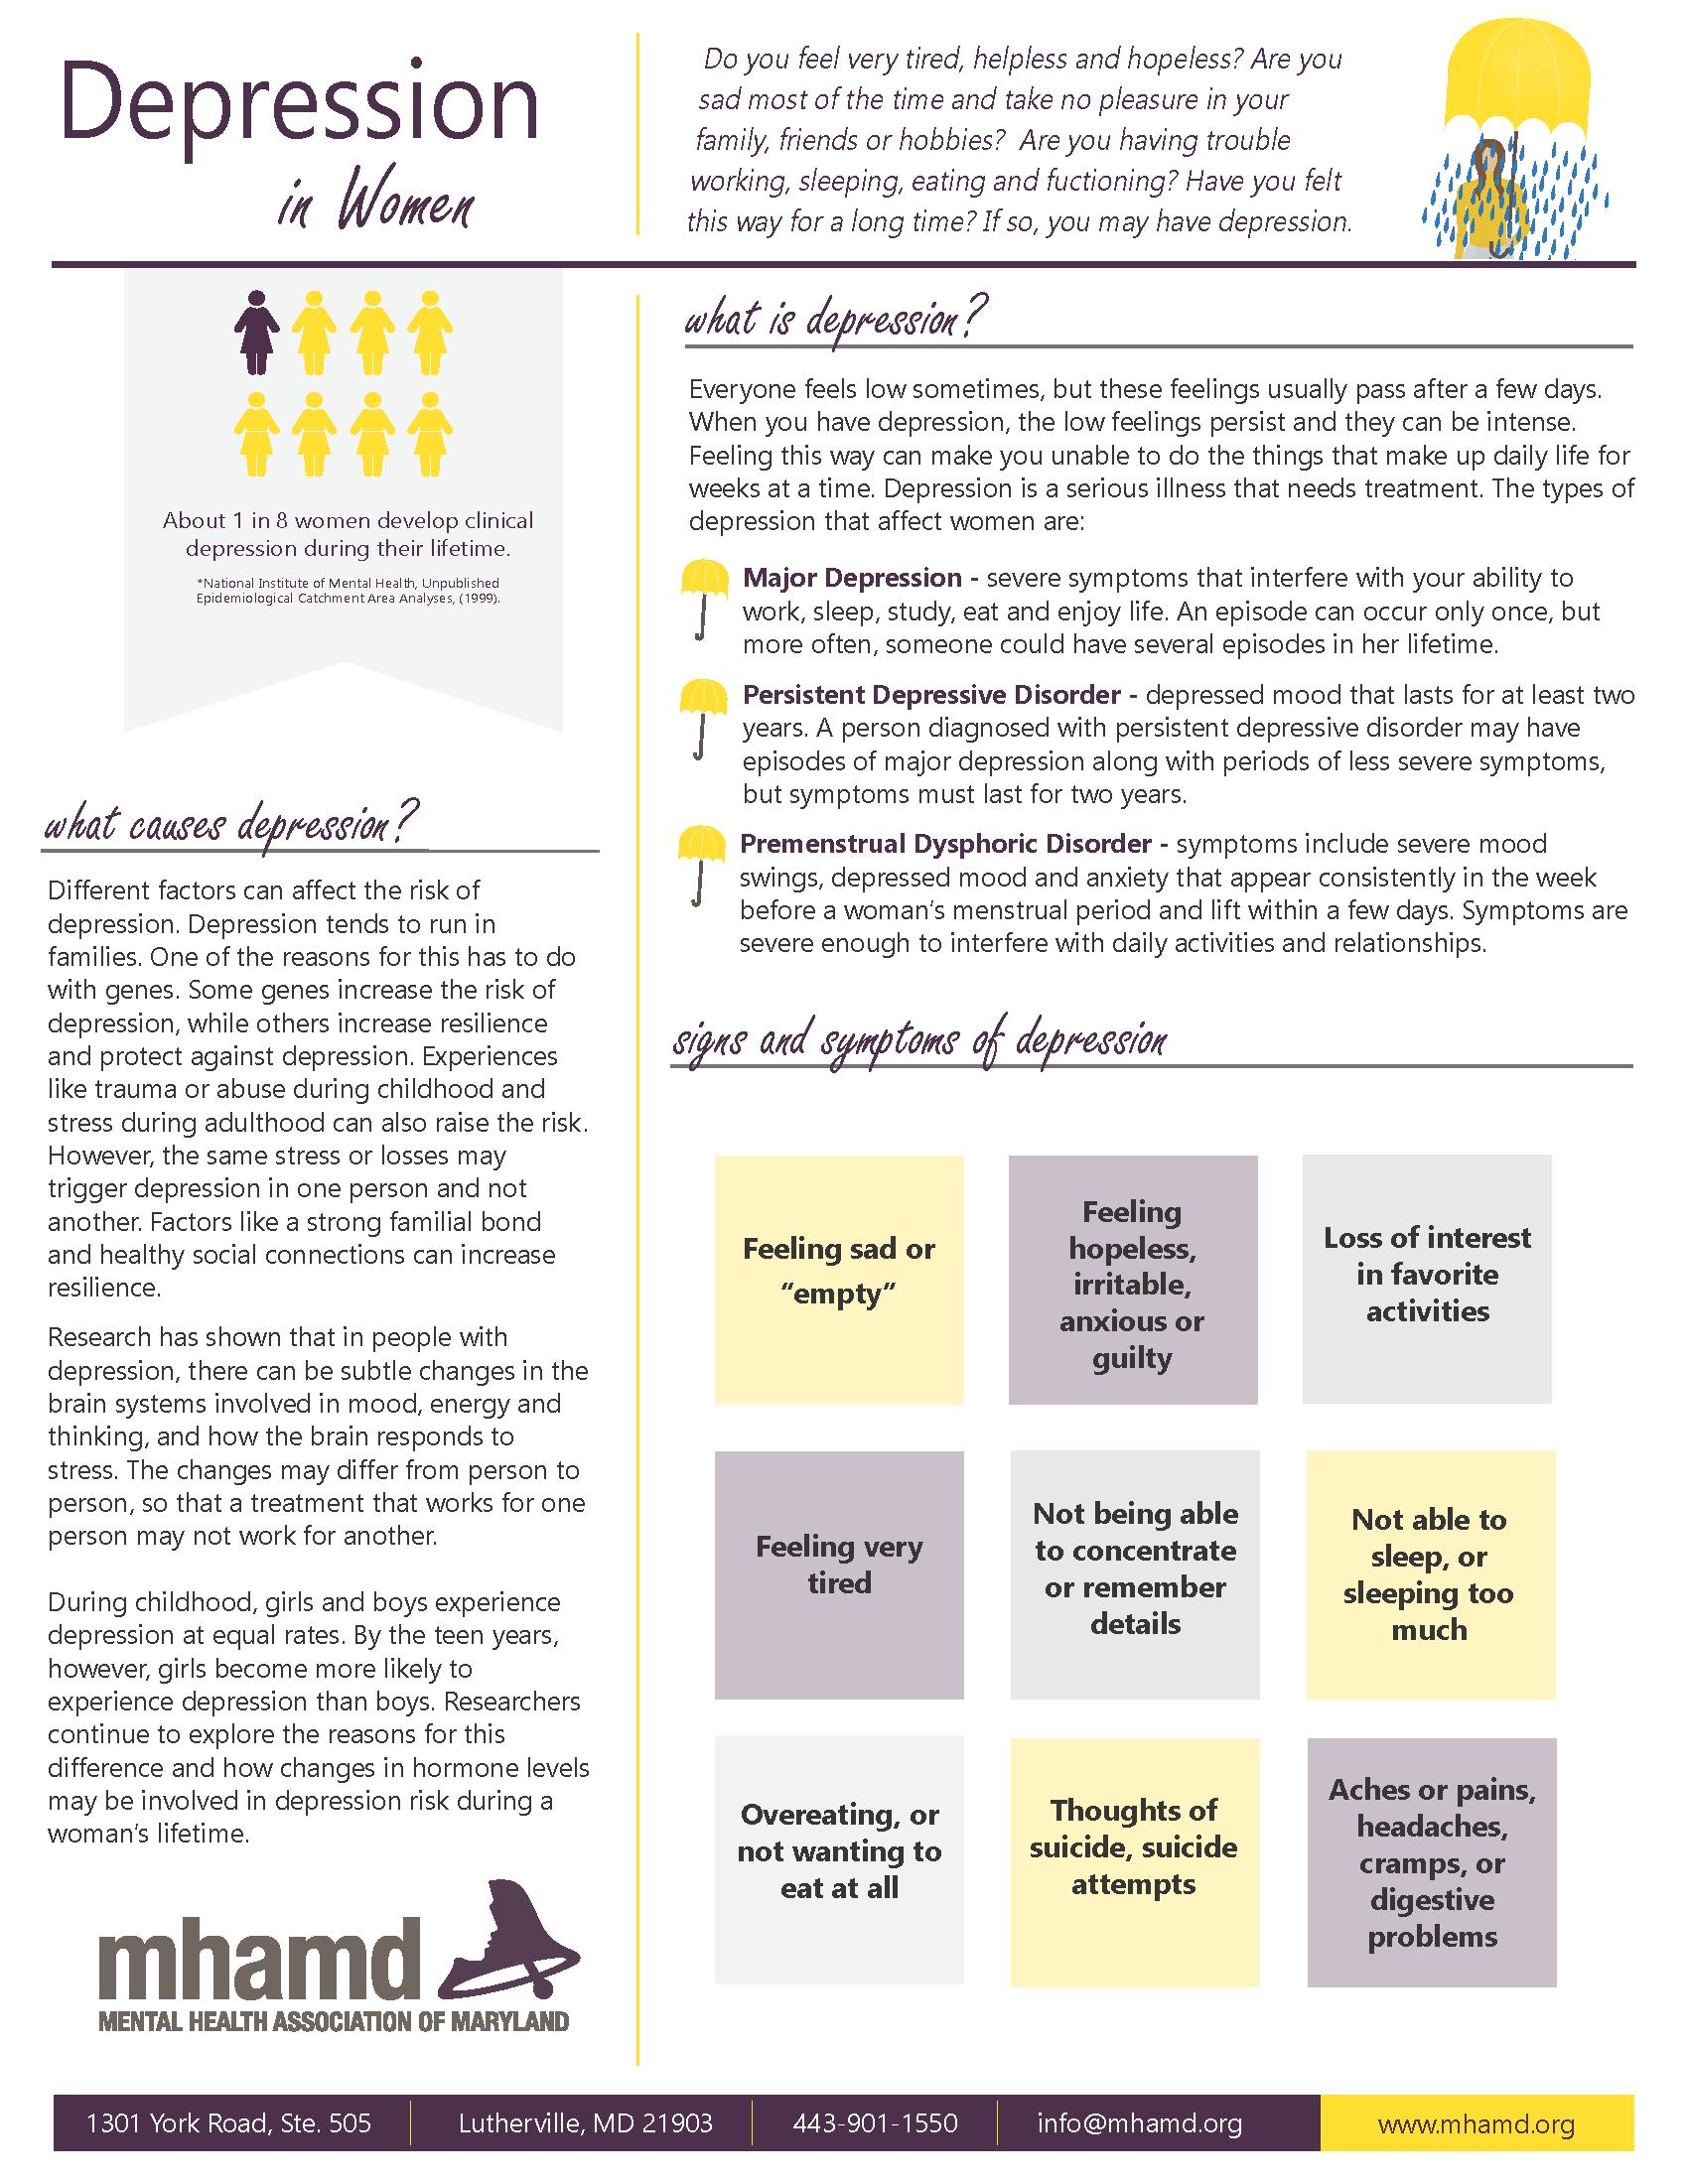 Icon Depression in Women Fact Sheet